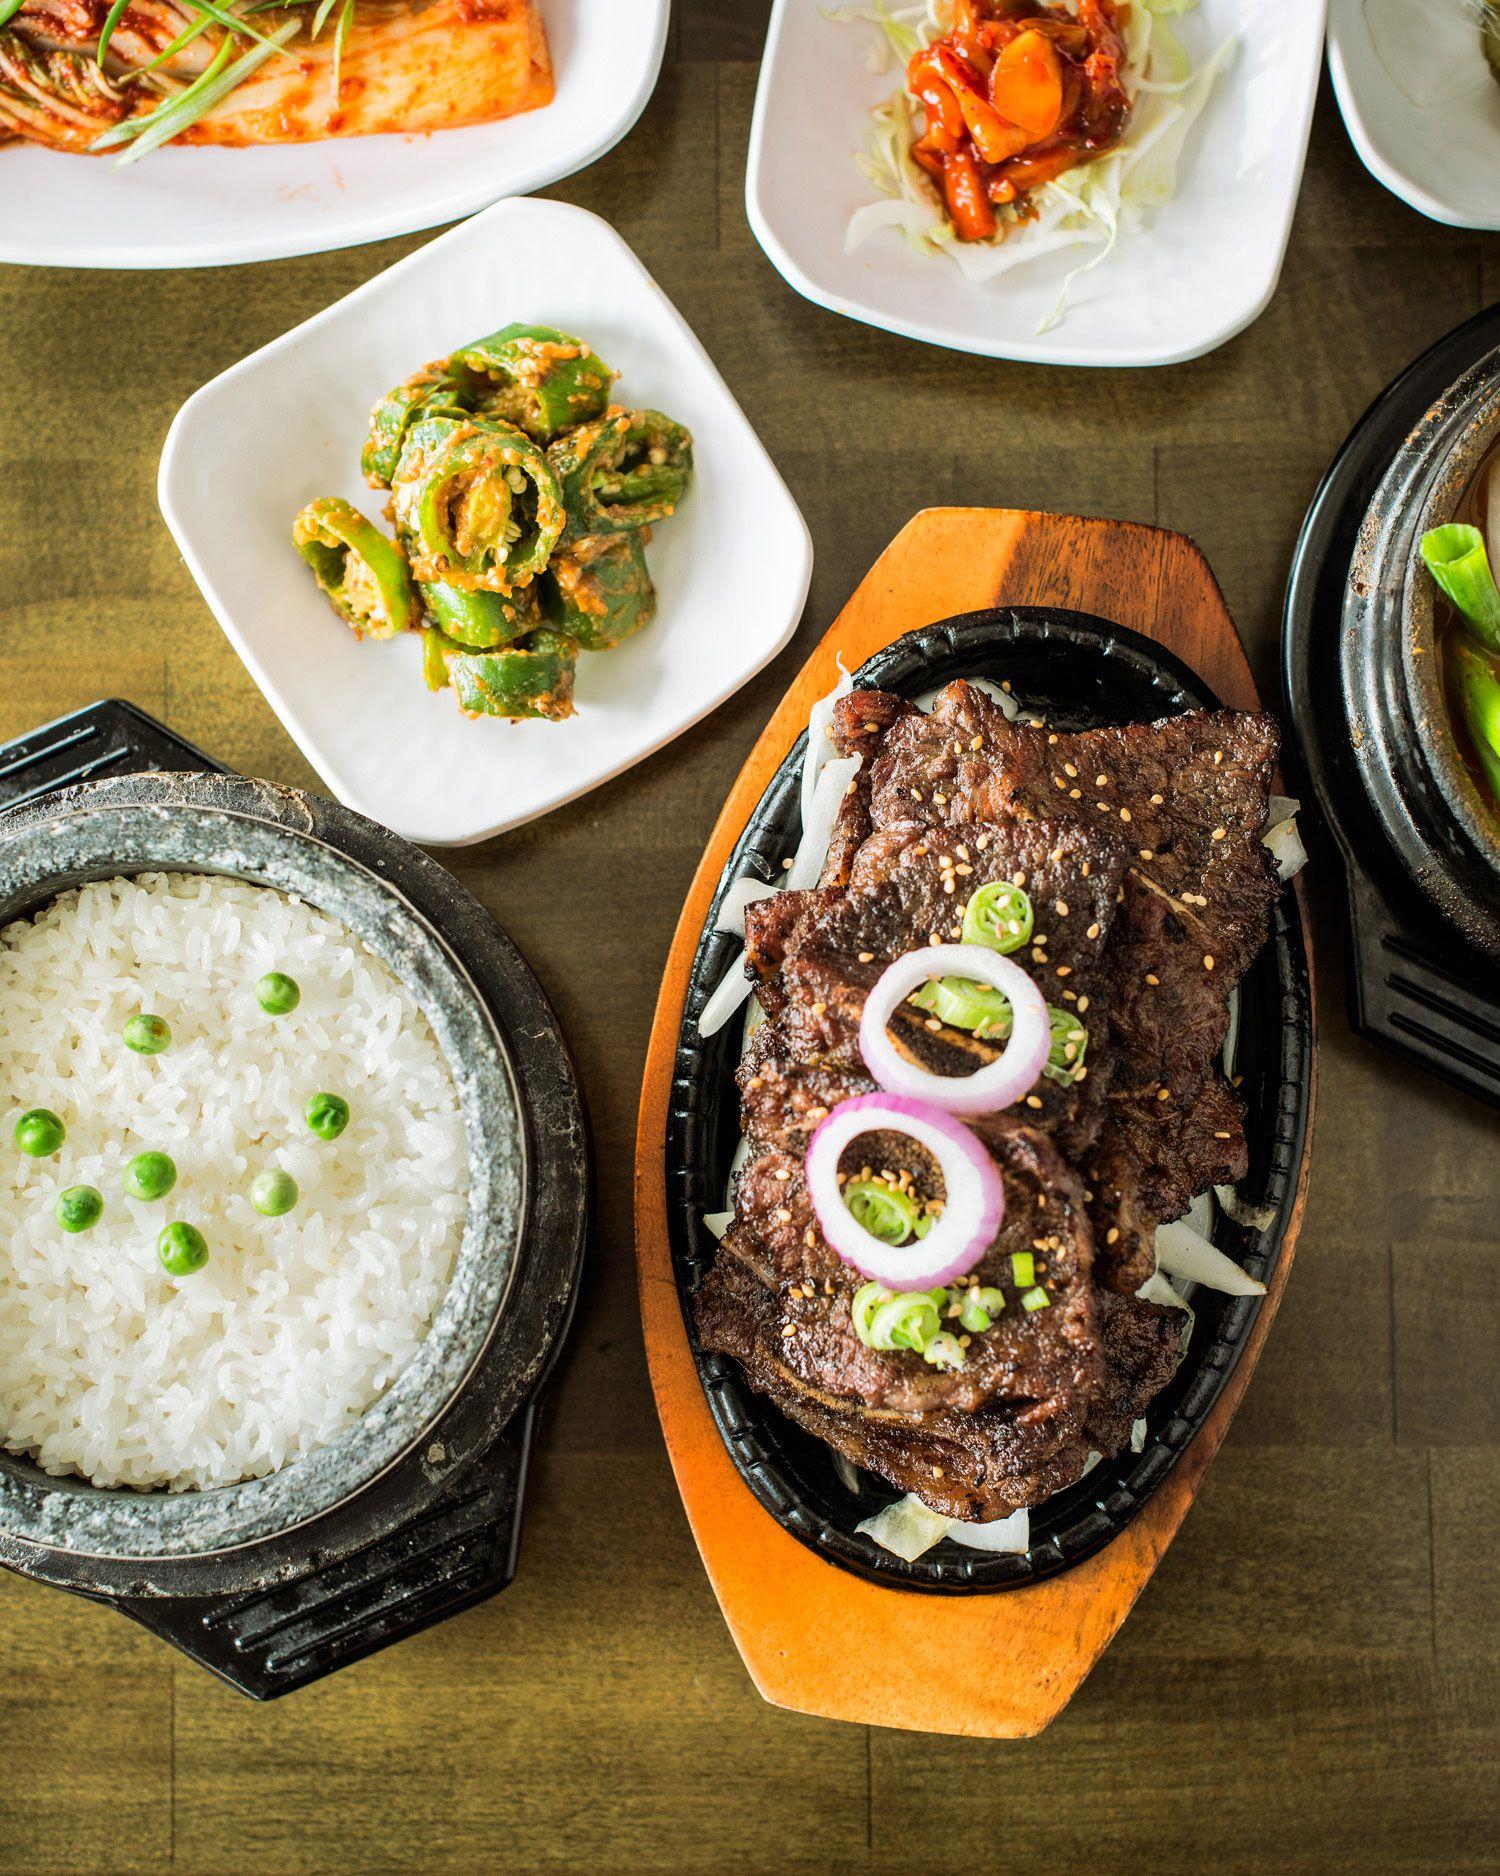 Korean Food 01 South Korean Food Korean Food Food